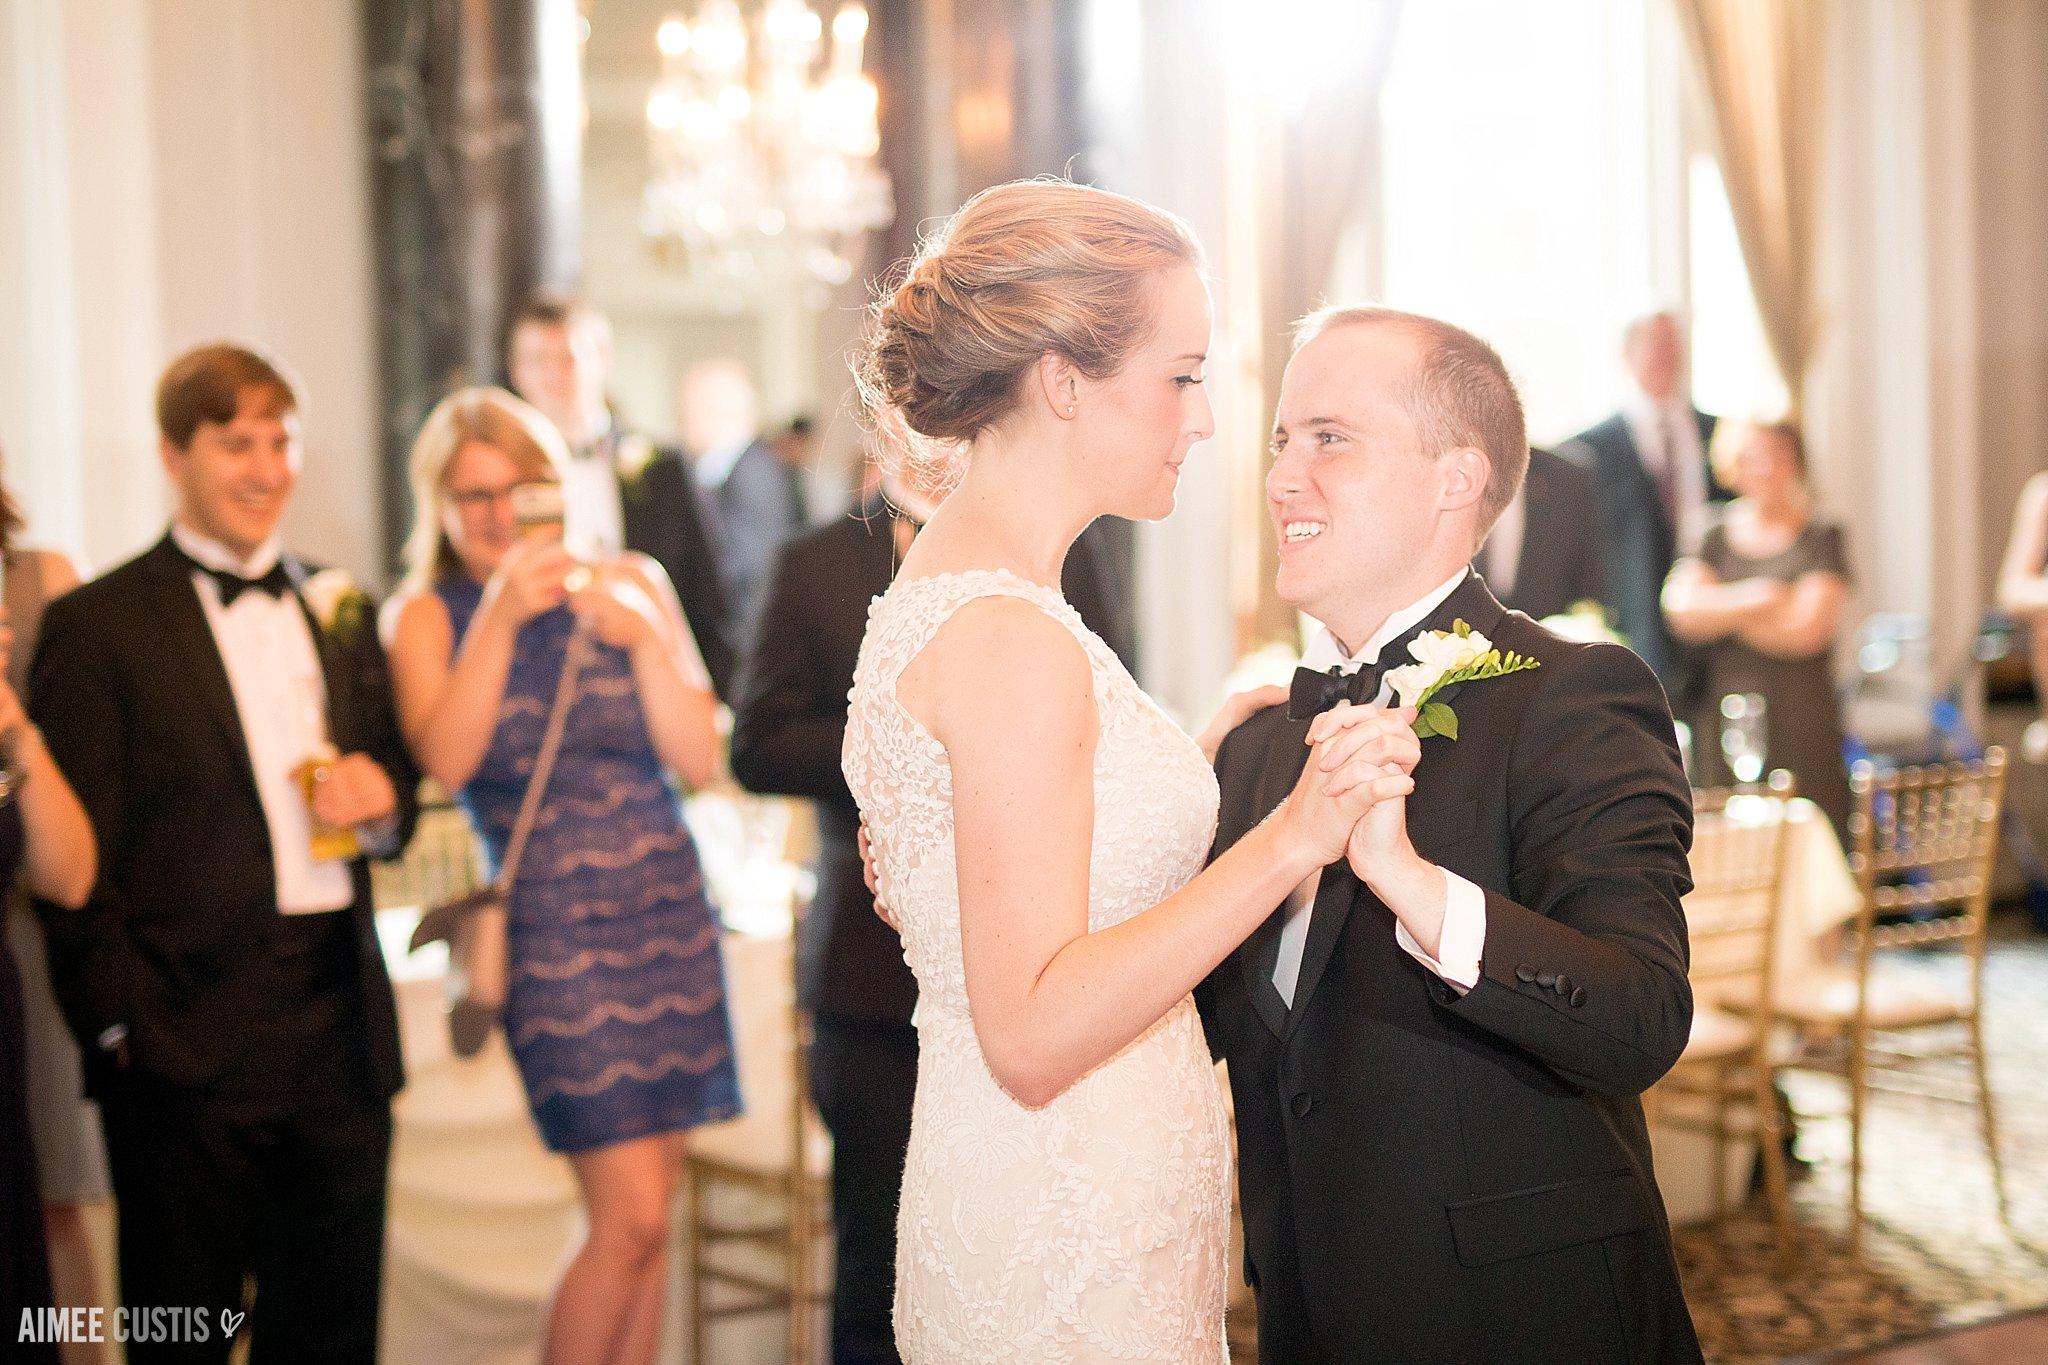 belvedere hotel baltimore wedding photography